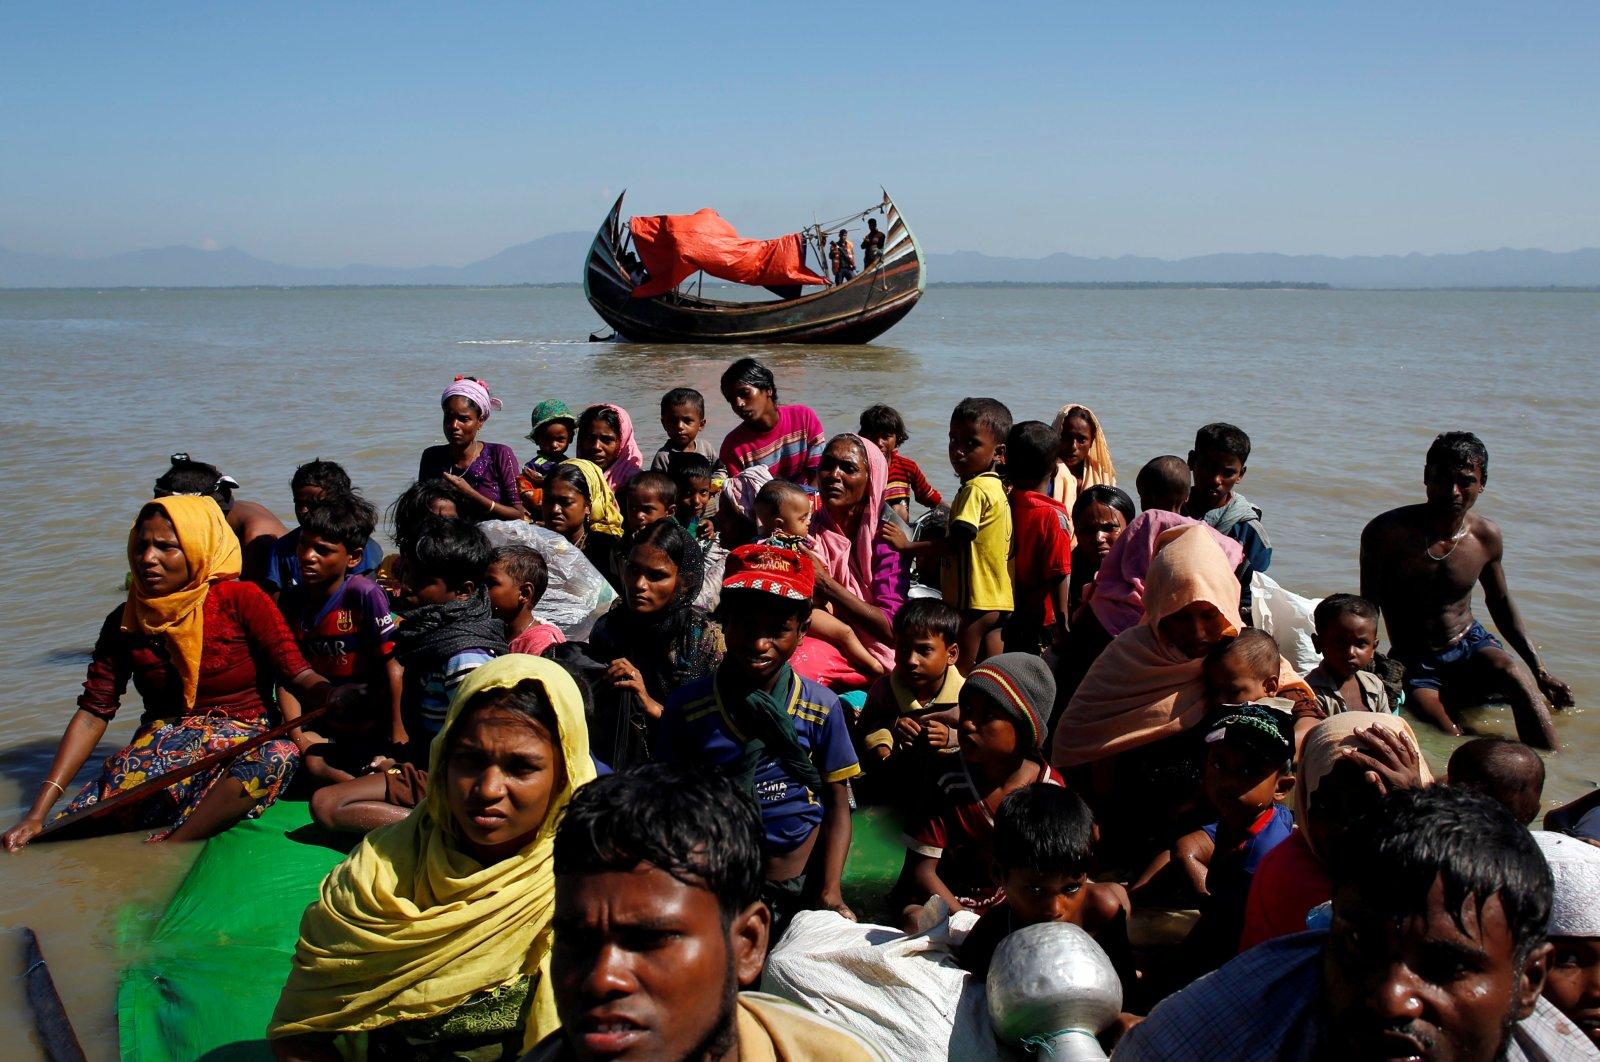 Rohingya refugees sit on a makeshift boat as they get interrogated by the Border Guard Bangladesh after crossing the Bangladesh-Myanmar border, at Shah Porir Dwip near Cox's Bazar, Bangladesh November 9, 2017. (Reuters Photo)